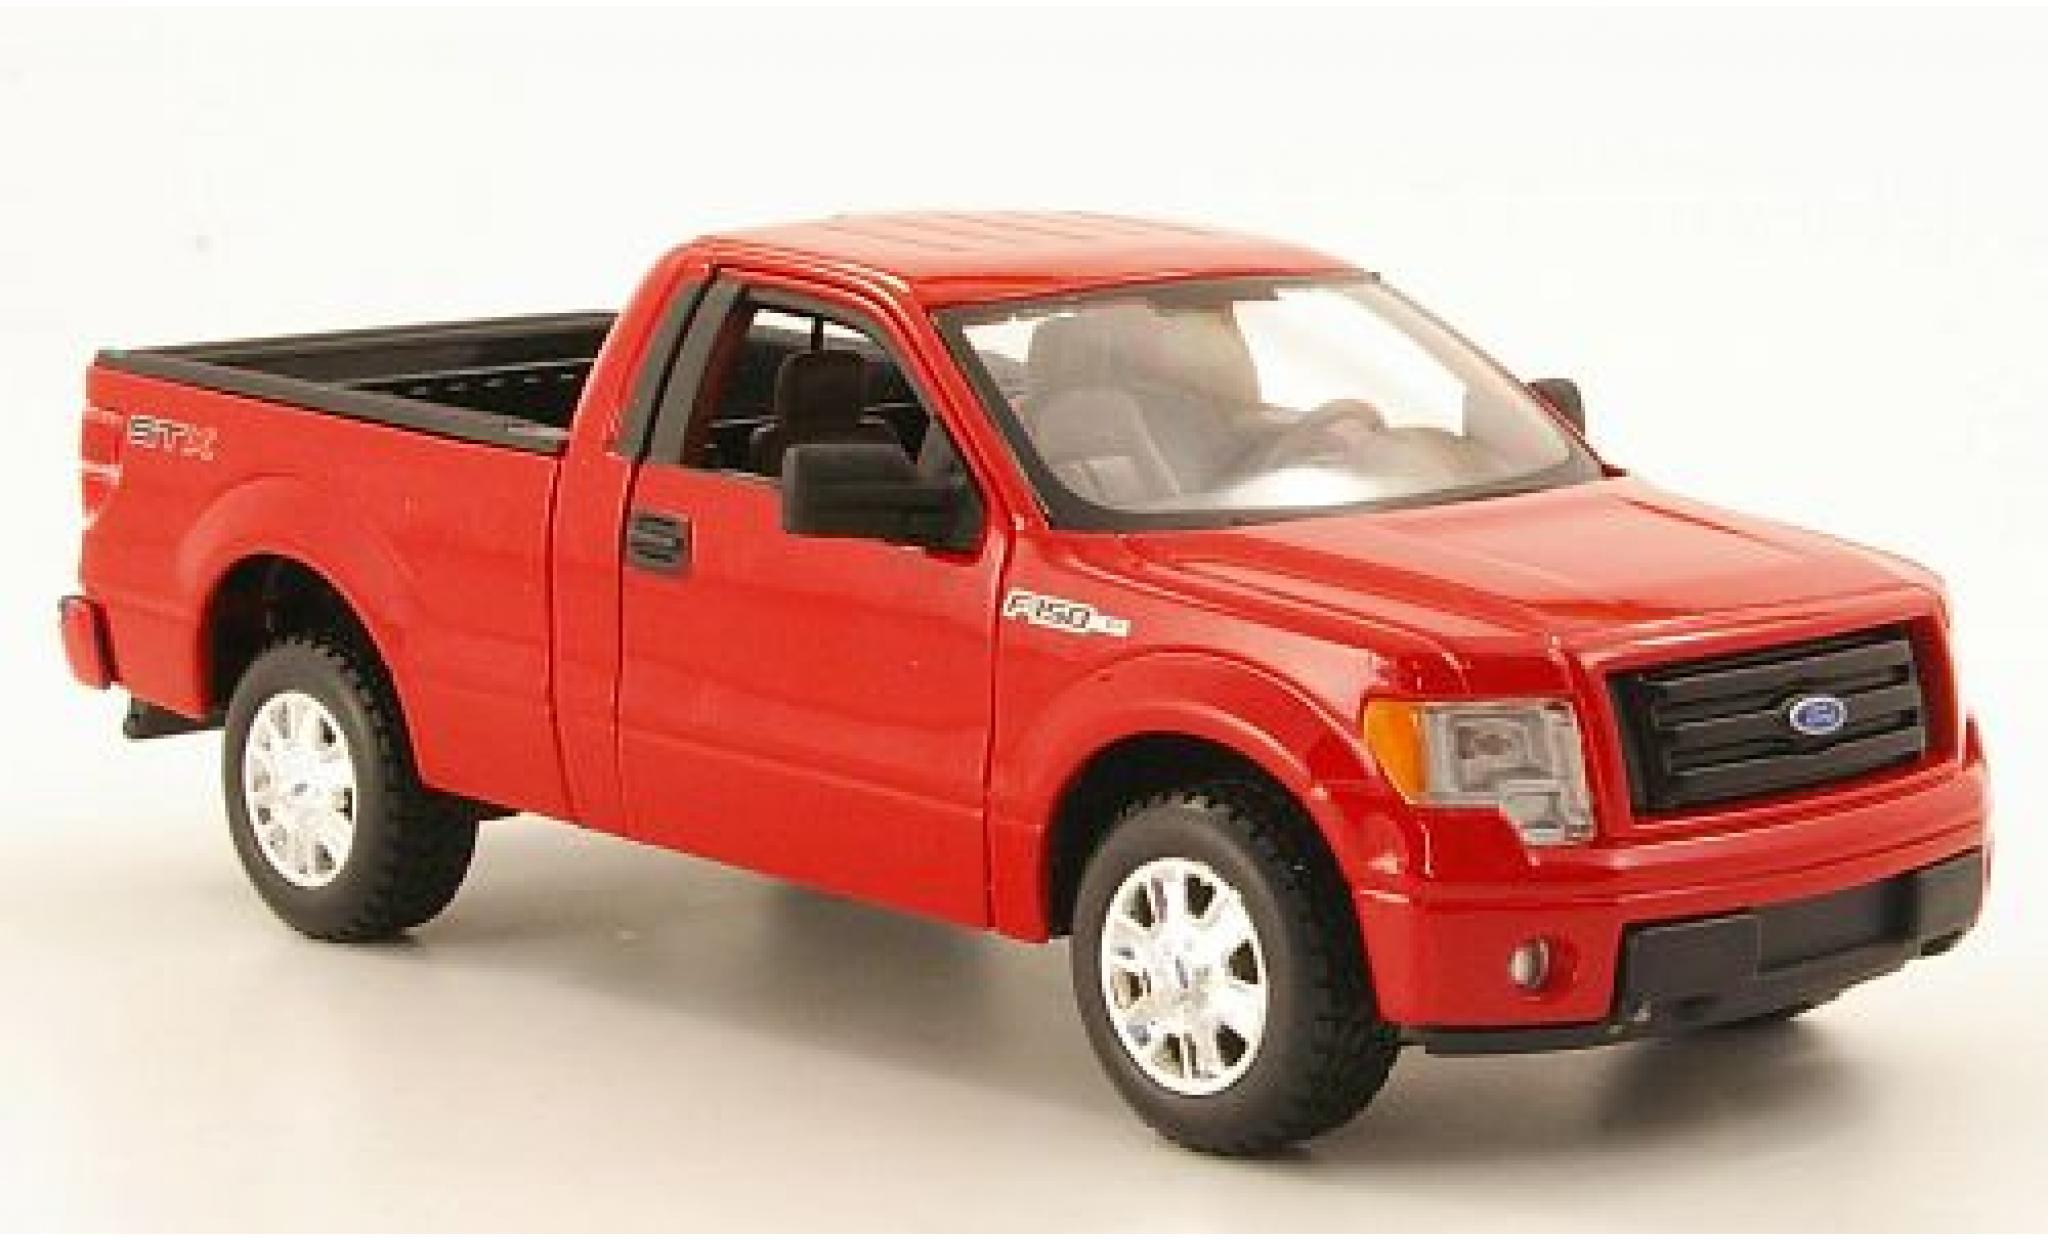 Ford F-1 1/24 Maisto 50 STX rouge 2010 1:27 sans Vitrine